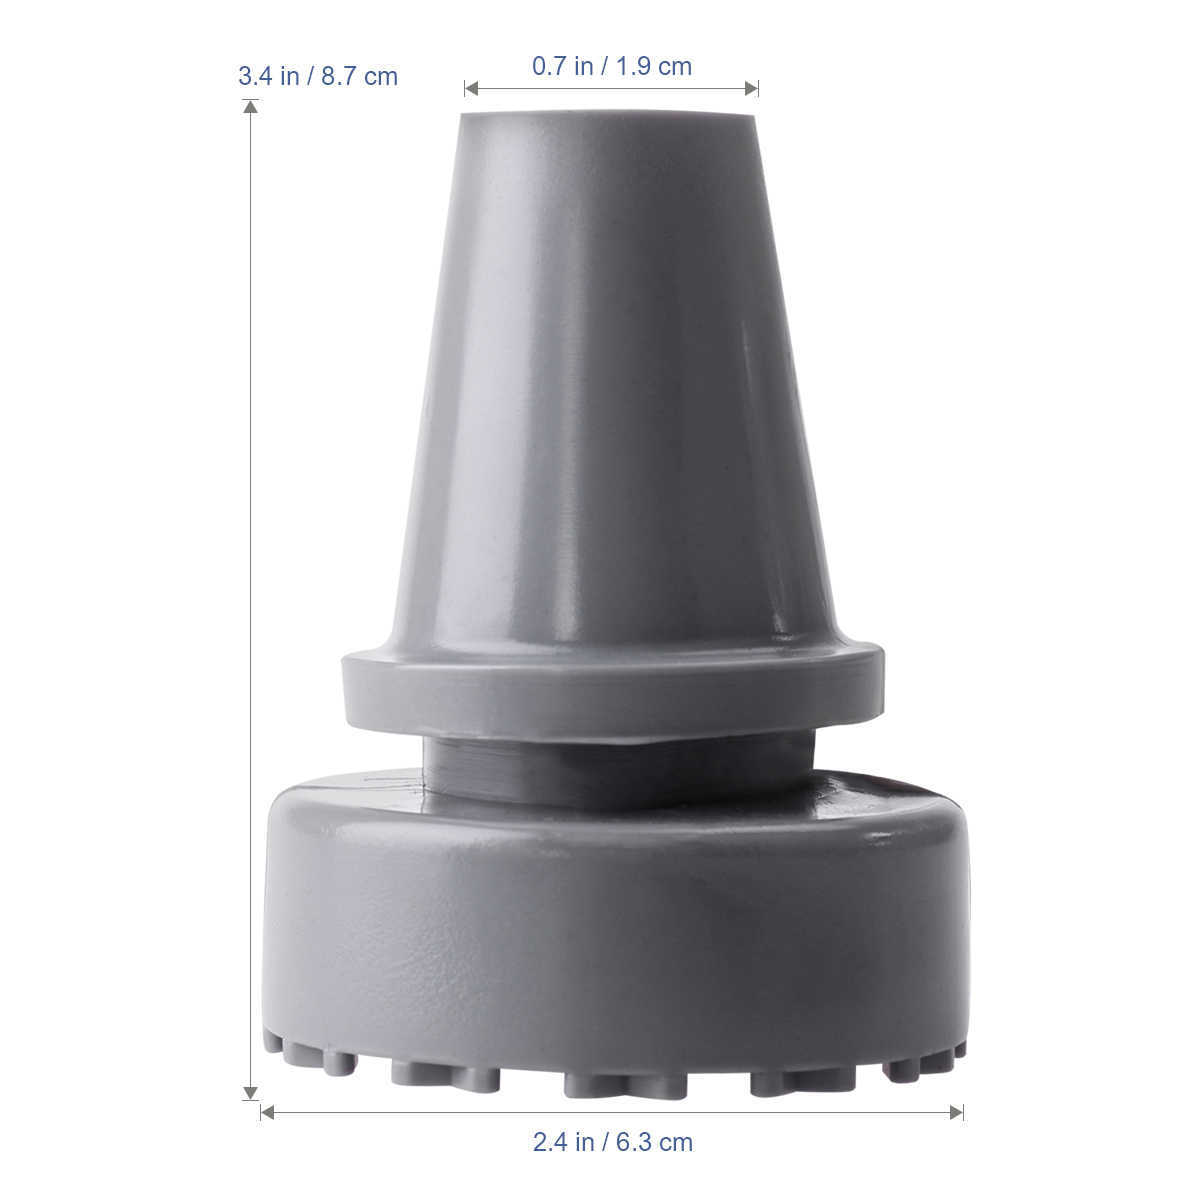 ROSENICE 19mm Silikon Spazierstock Füße Innen Durchmesser Gummi Kopf Krücke Zubehör Antislip Tipps Krücke Gummi Füße (Grau)